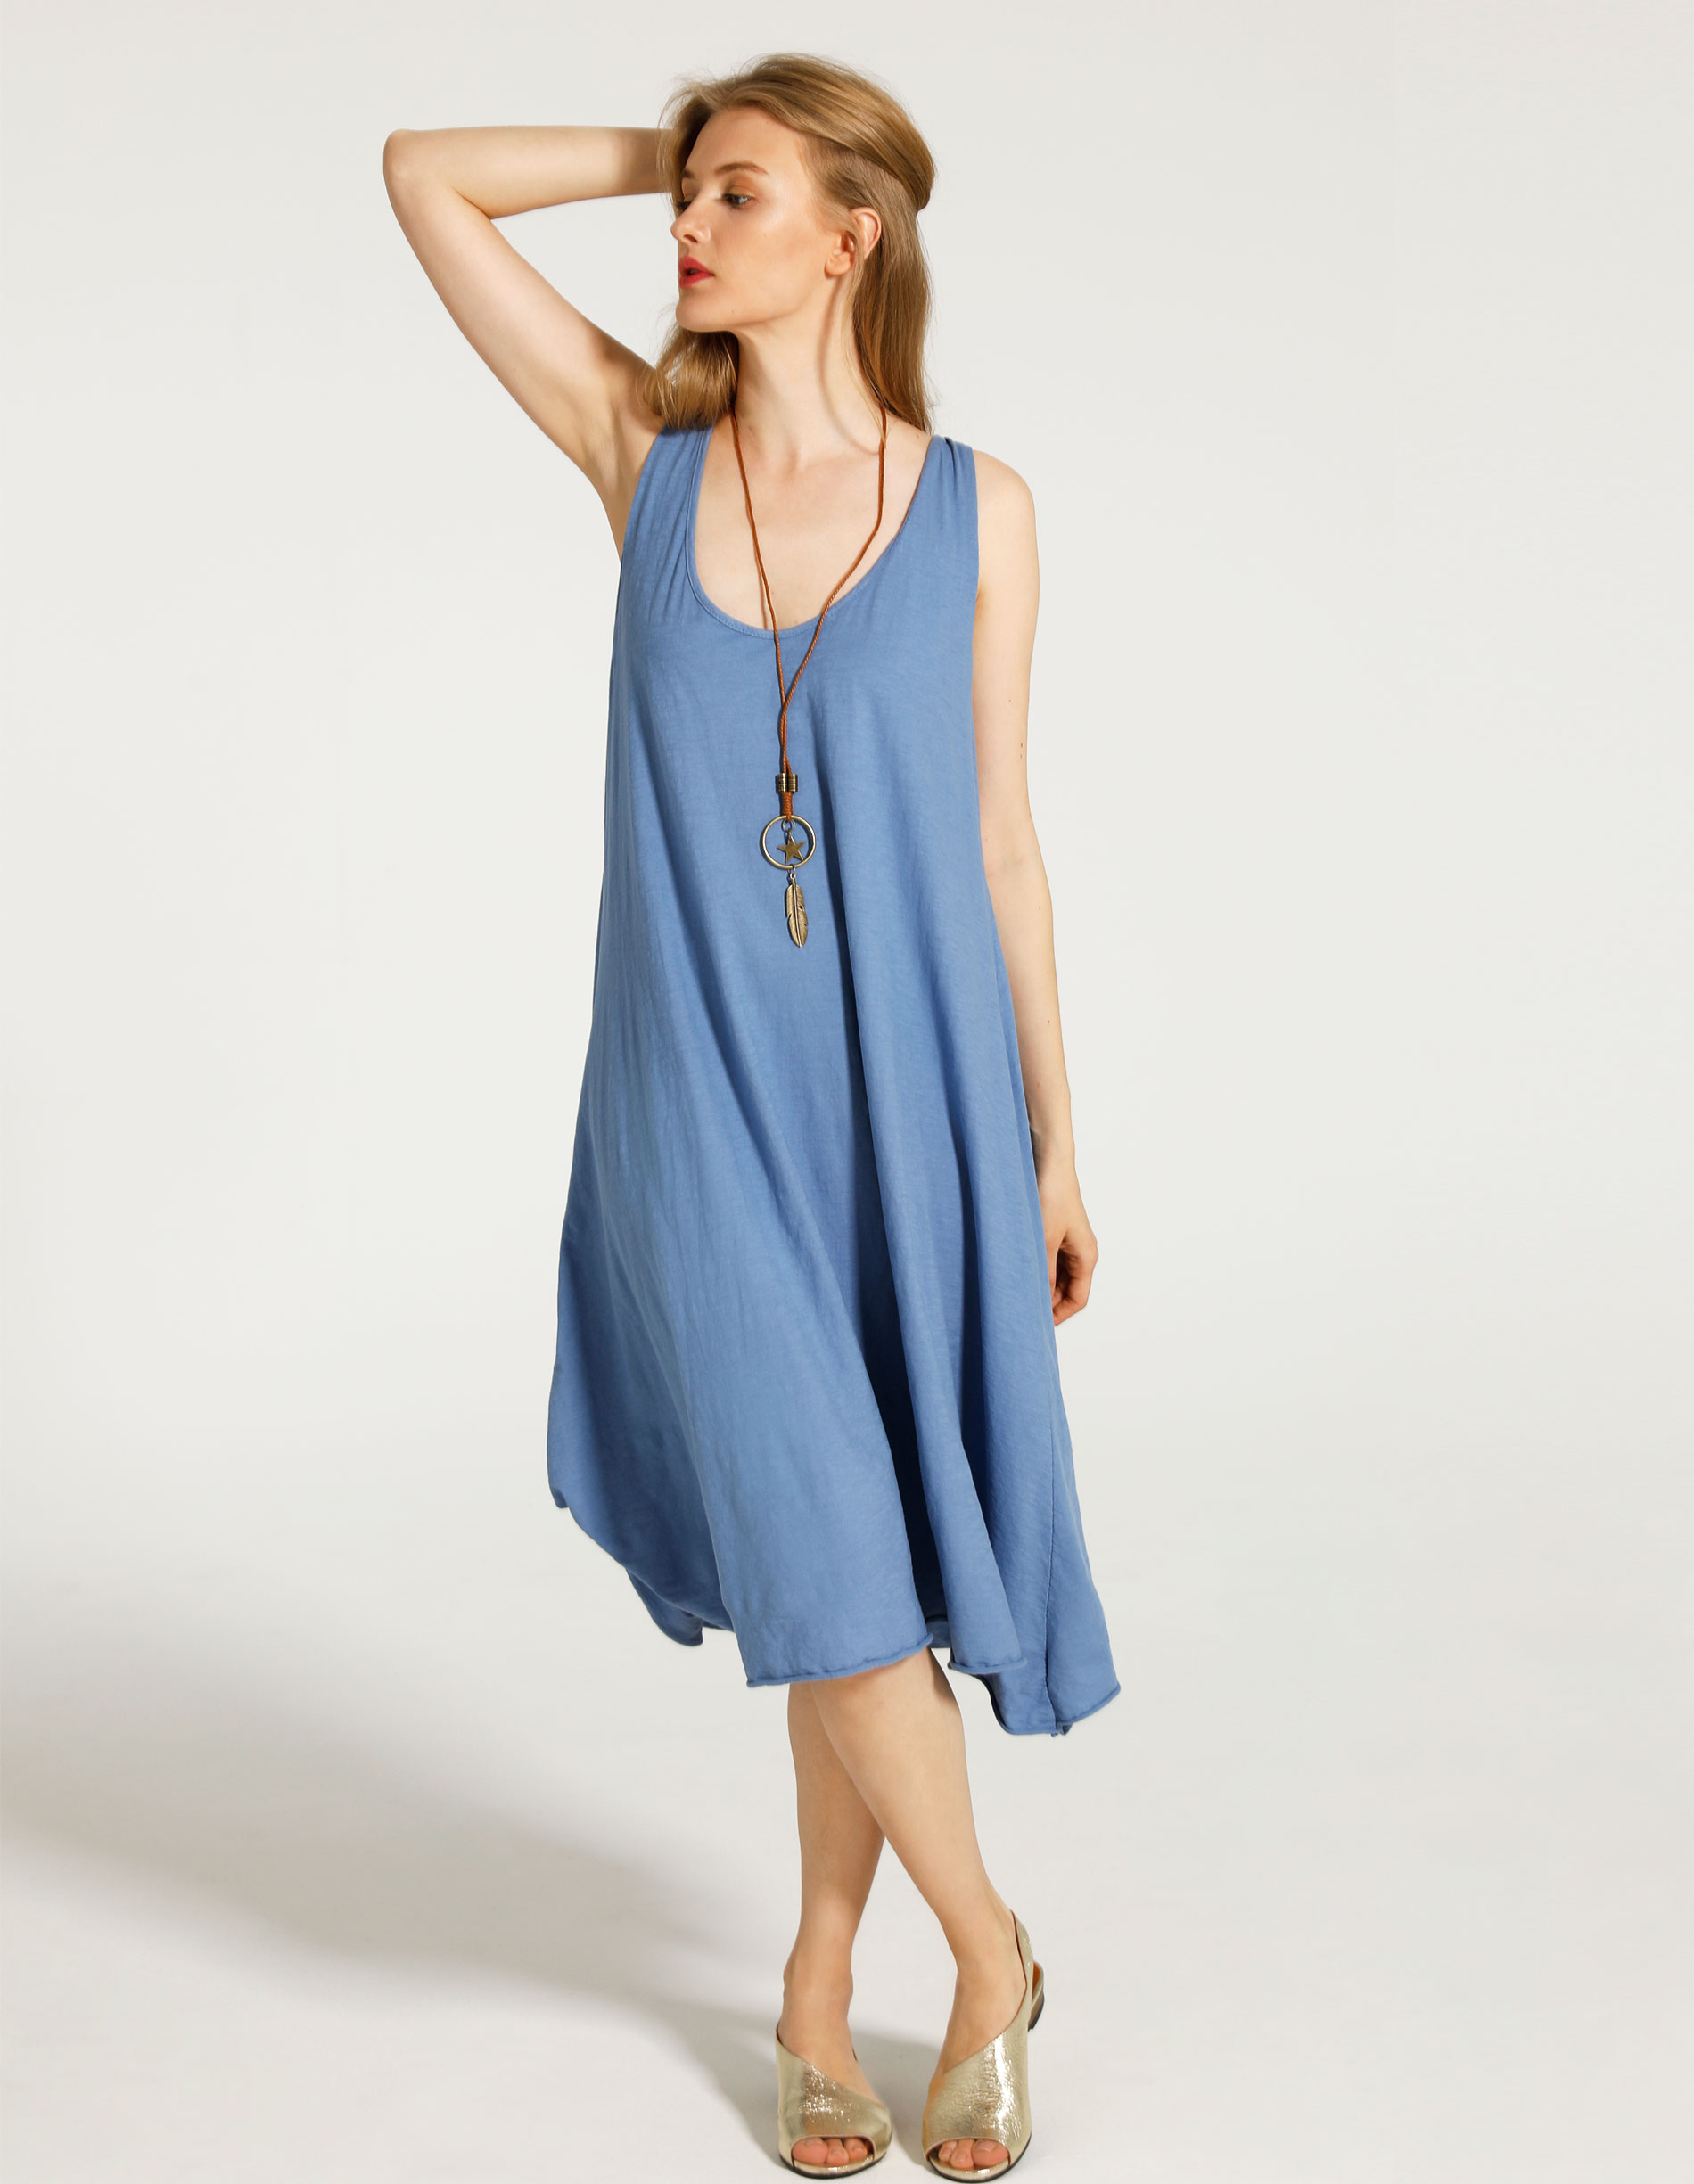 Sukienka - 85-7751 JEANS - Unisono